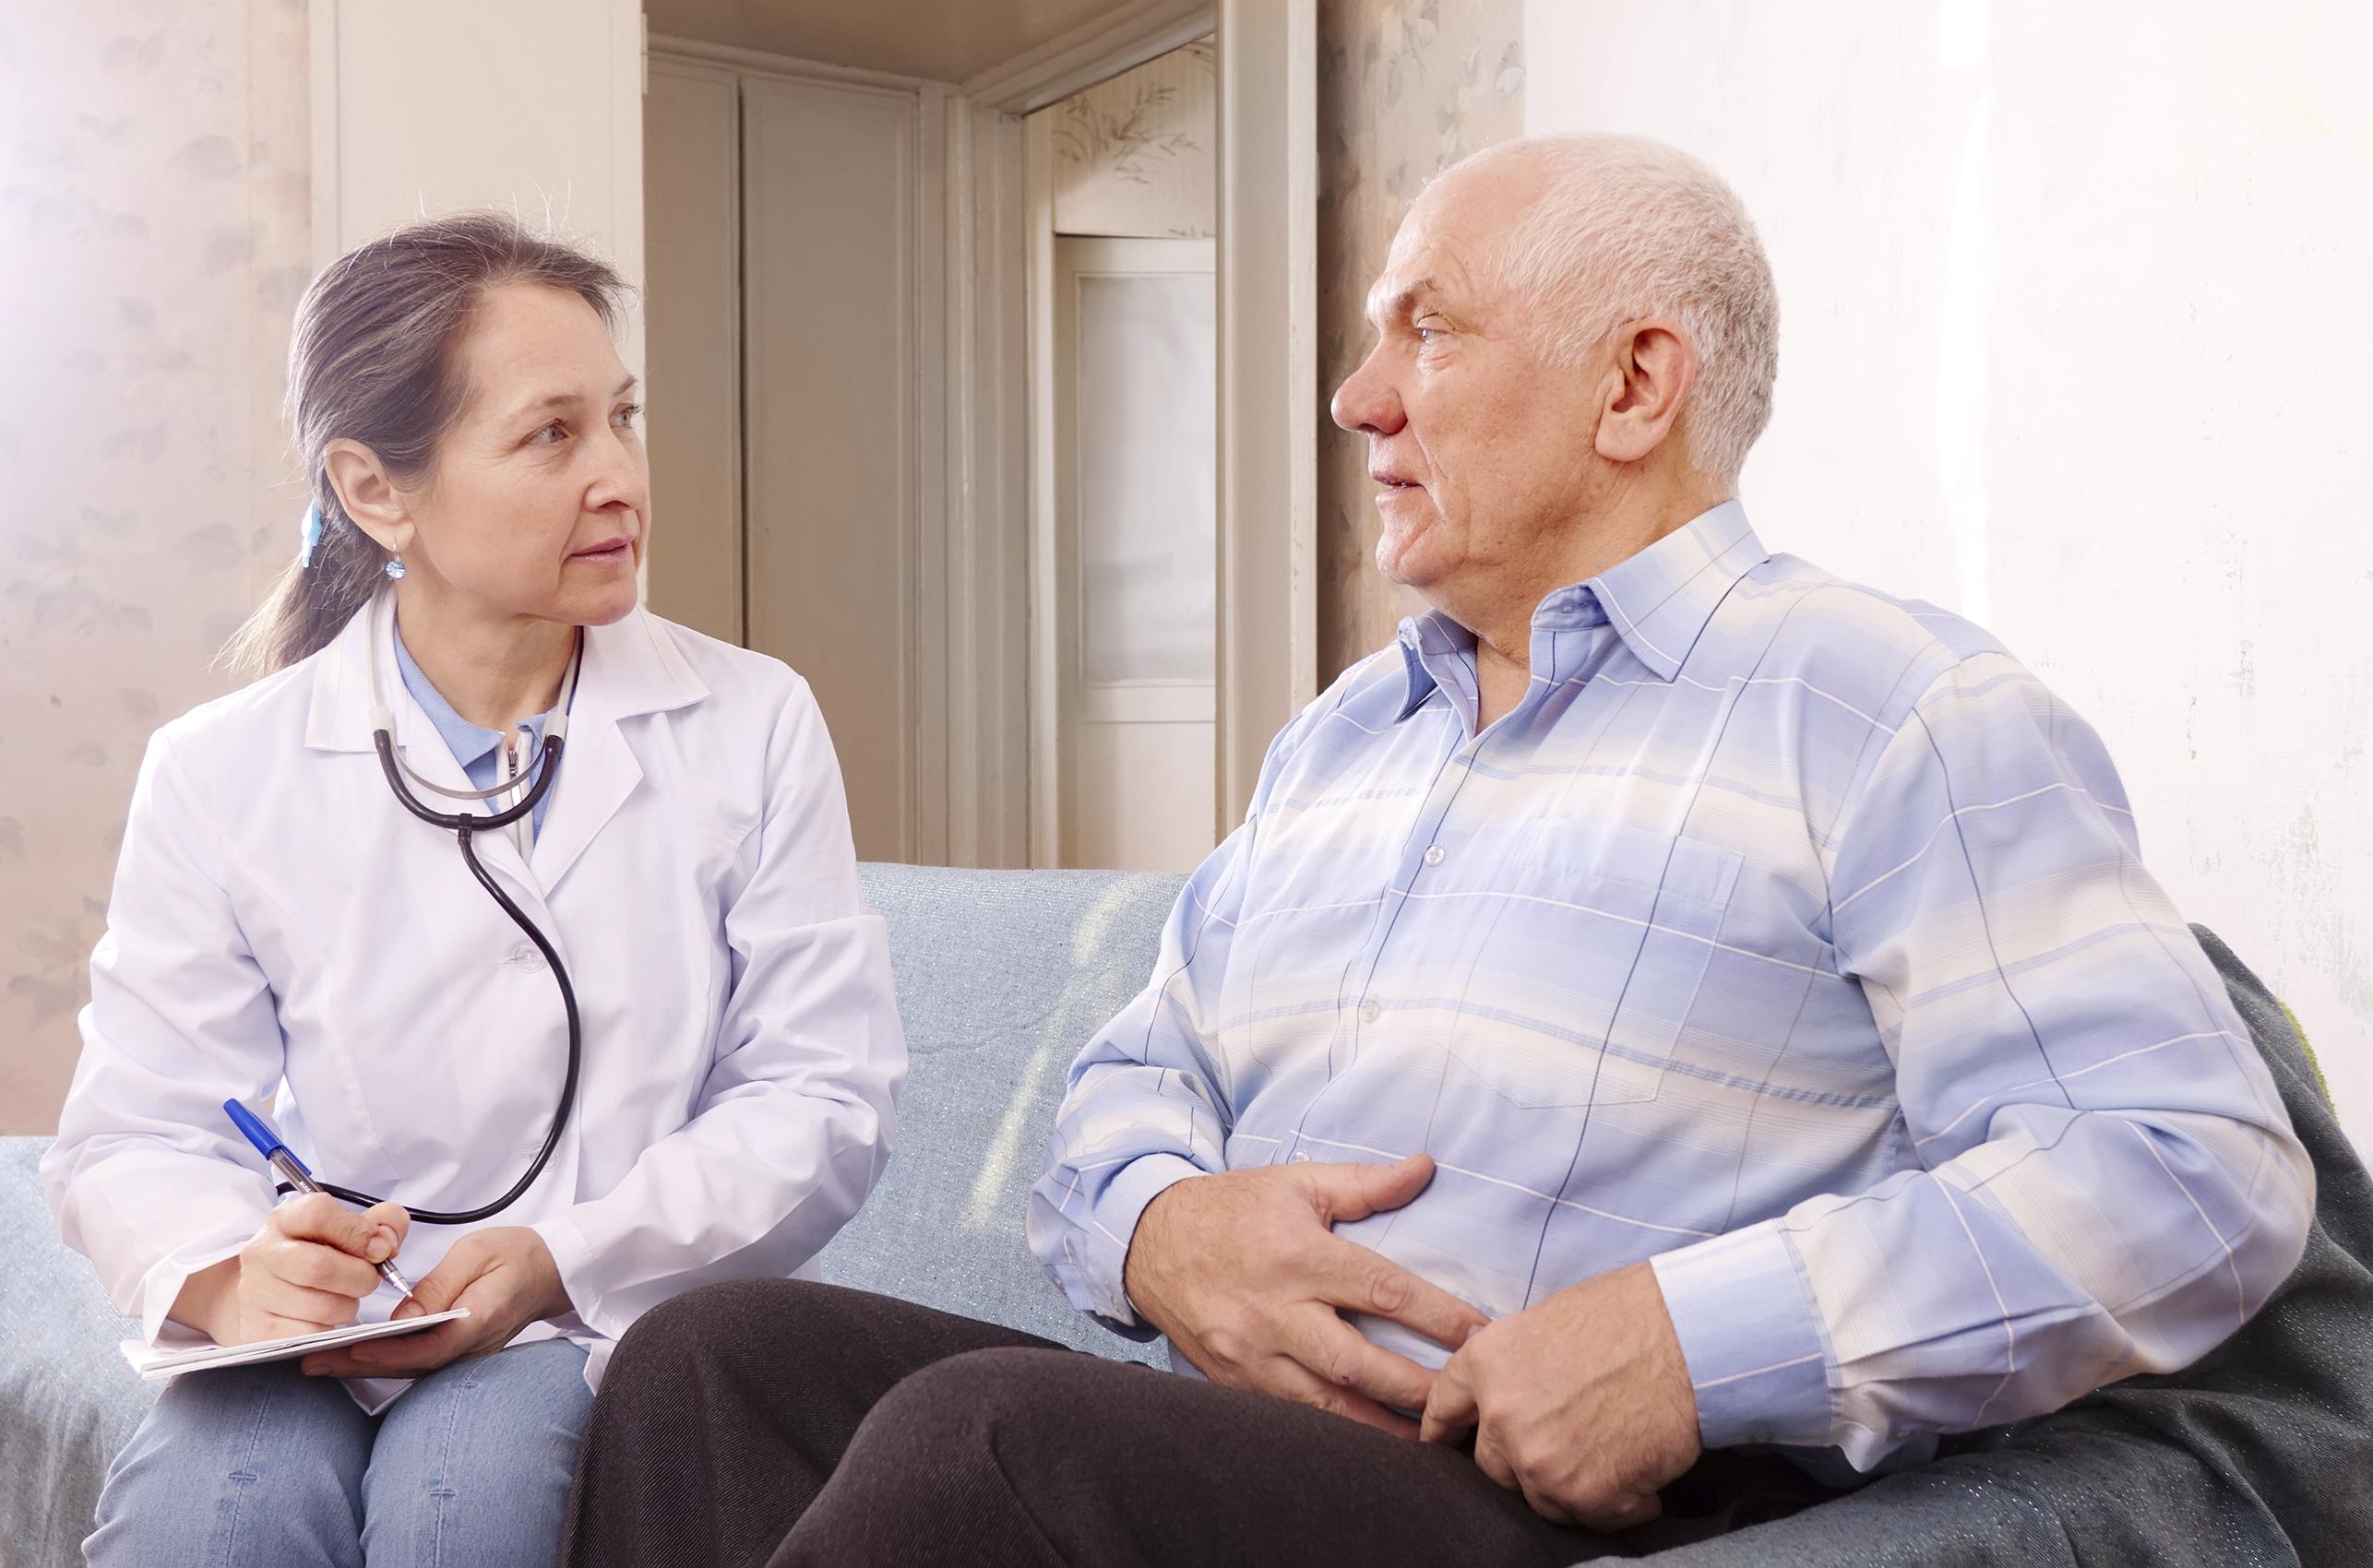 Newer, minimally invasive surgical techniques help treat Crohn's Disease